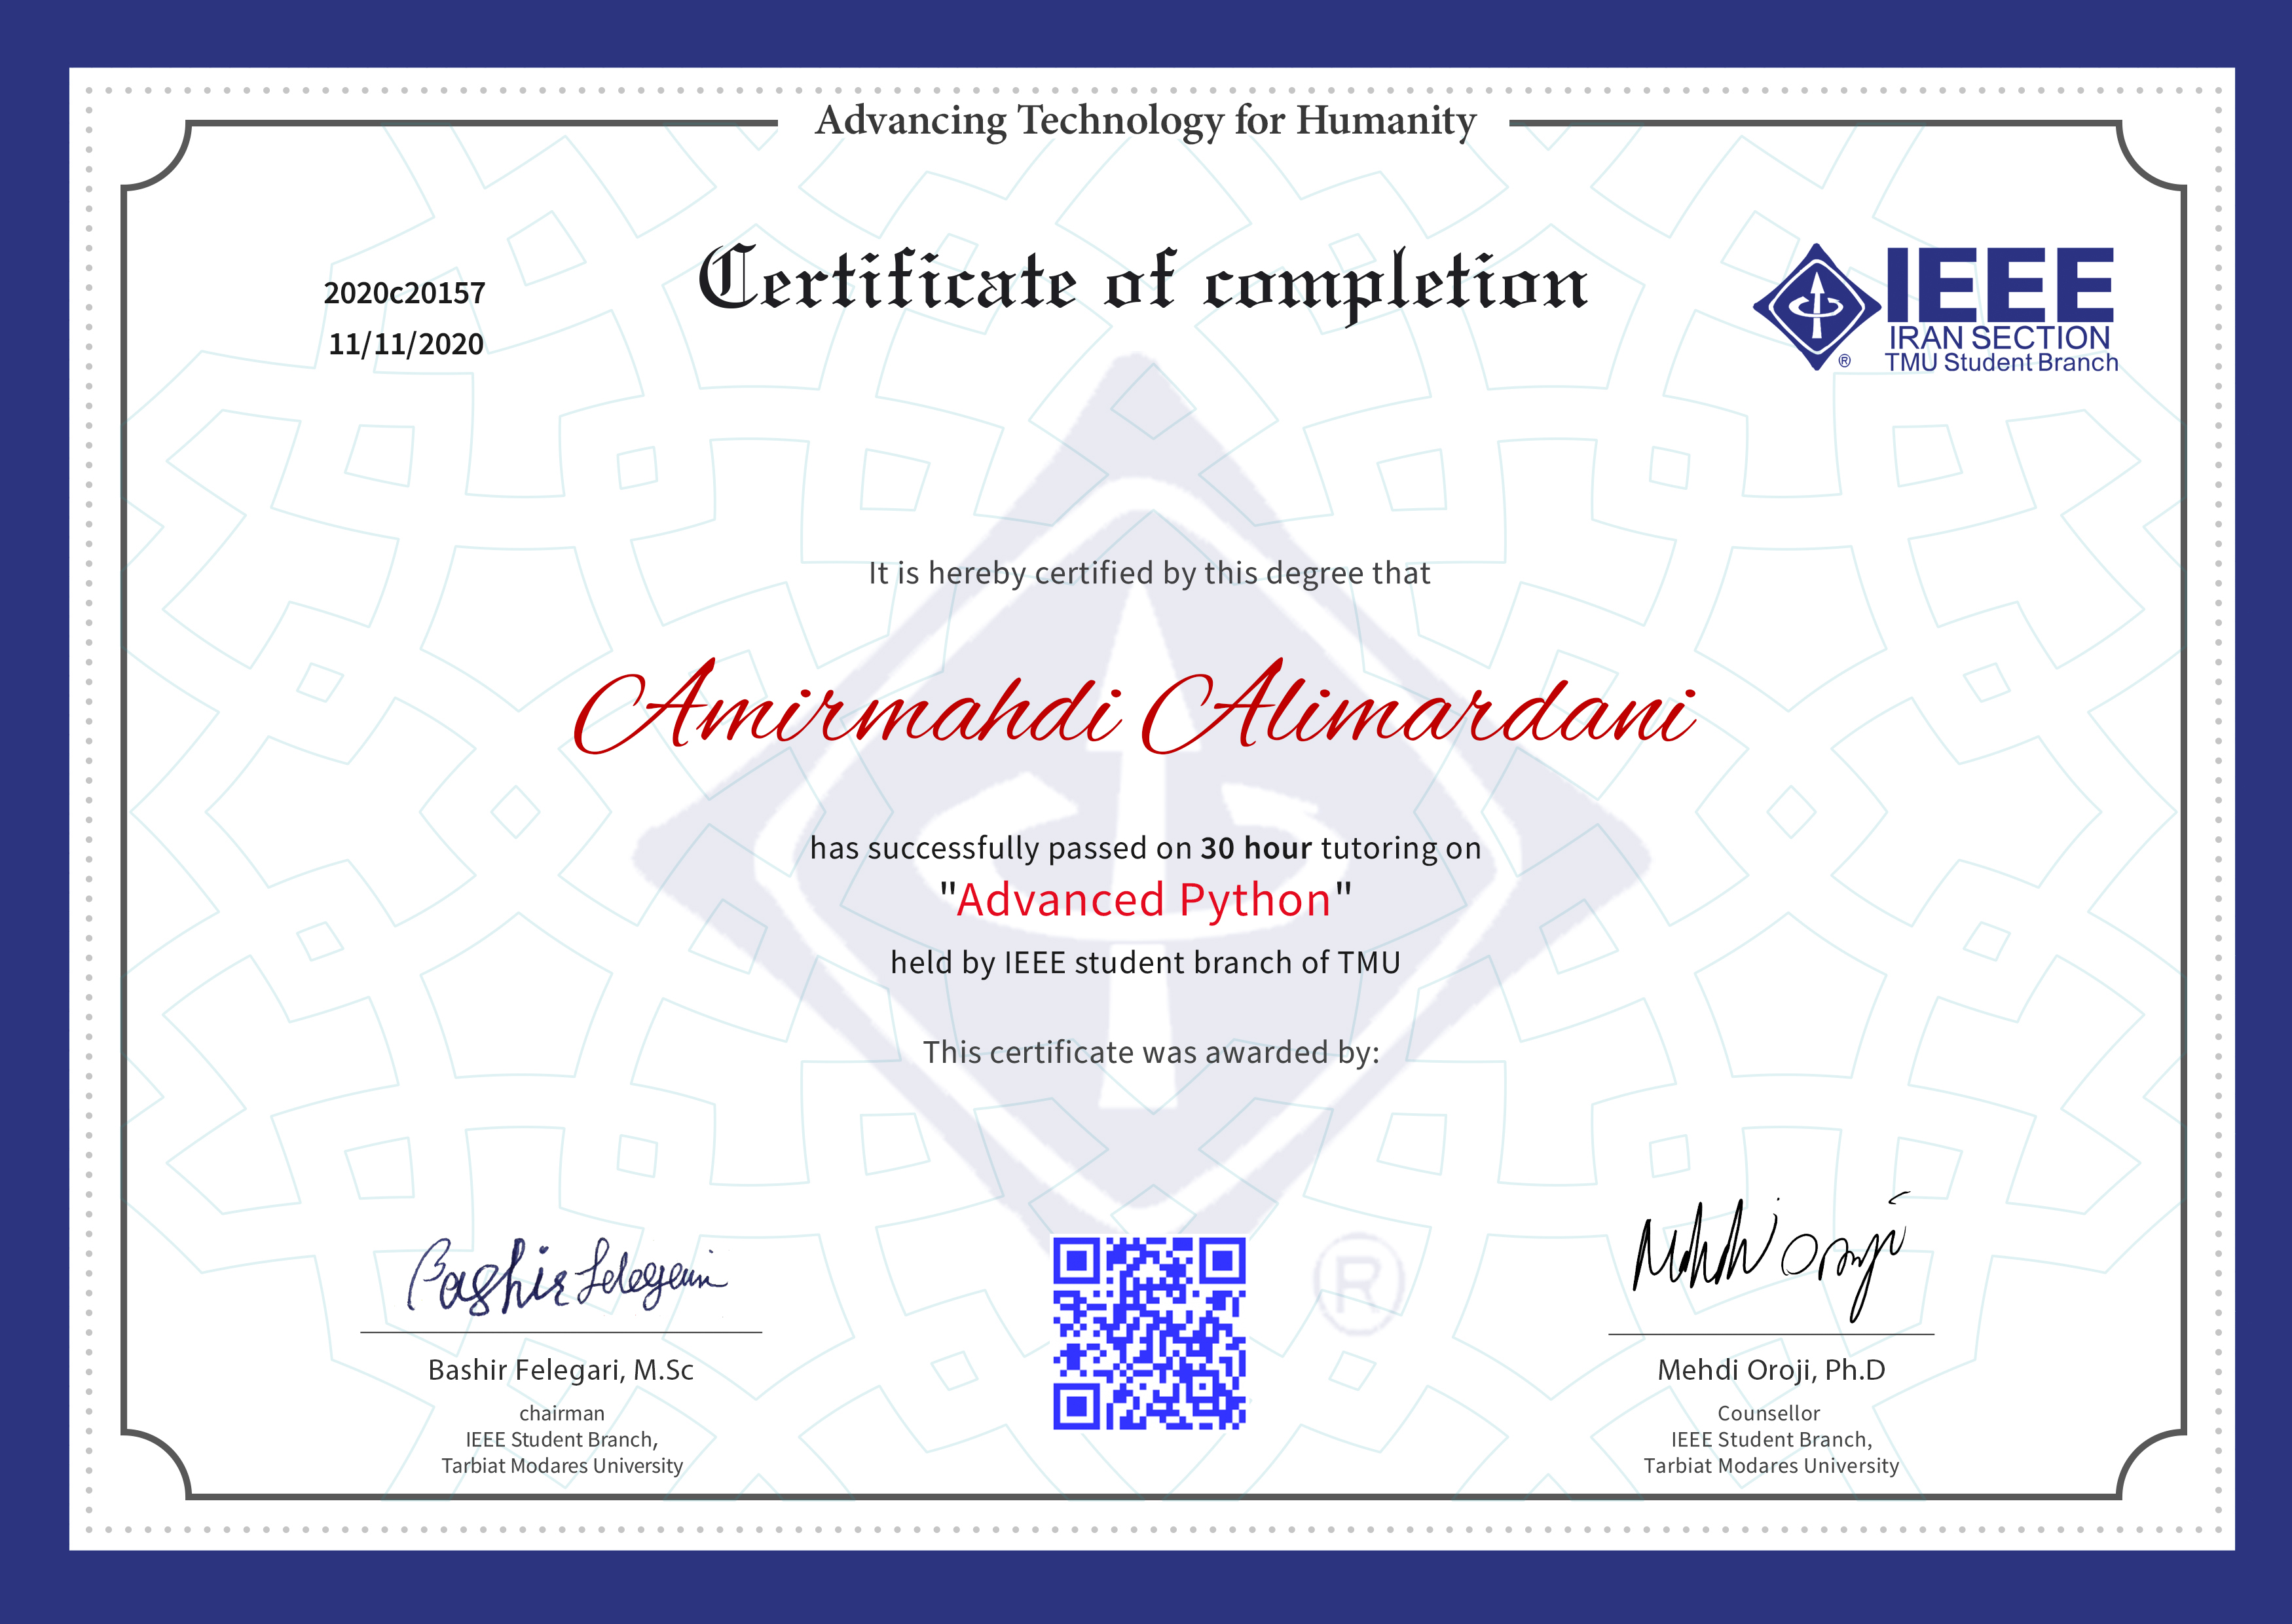 Amirmahdi Alimardani